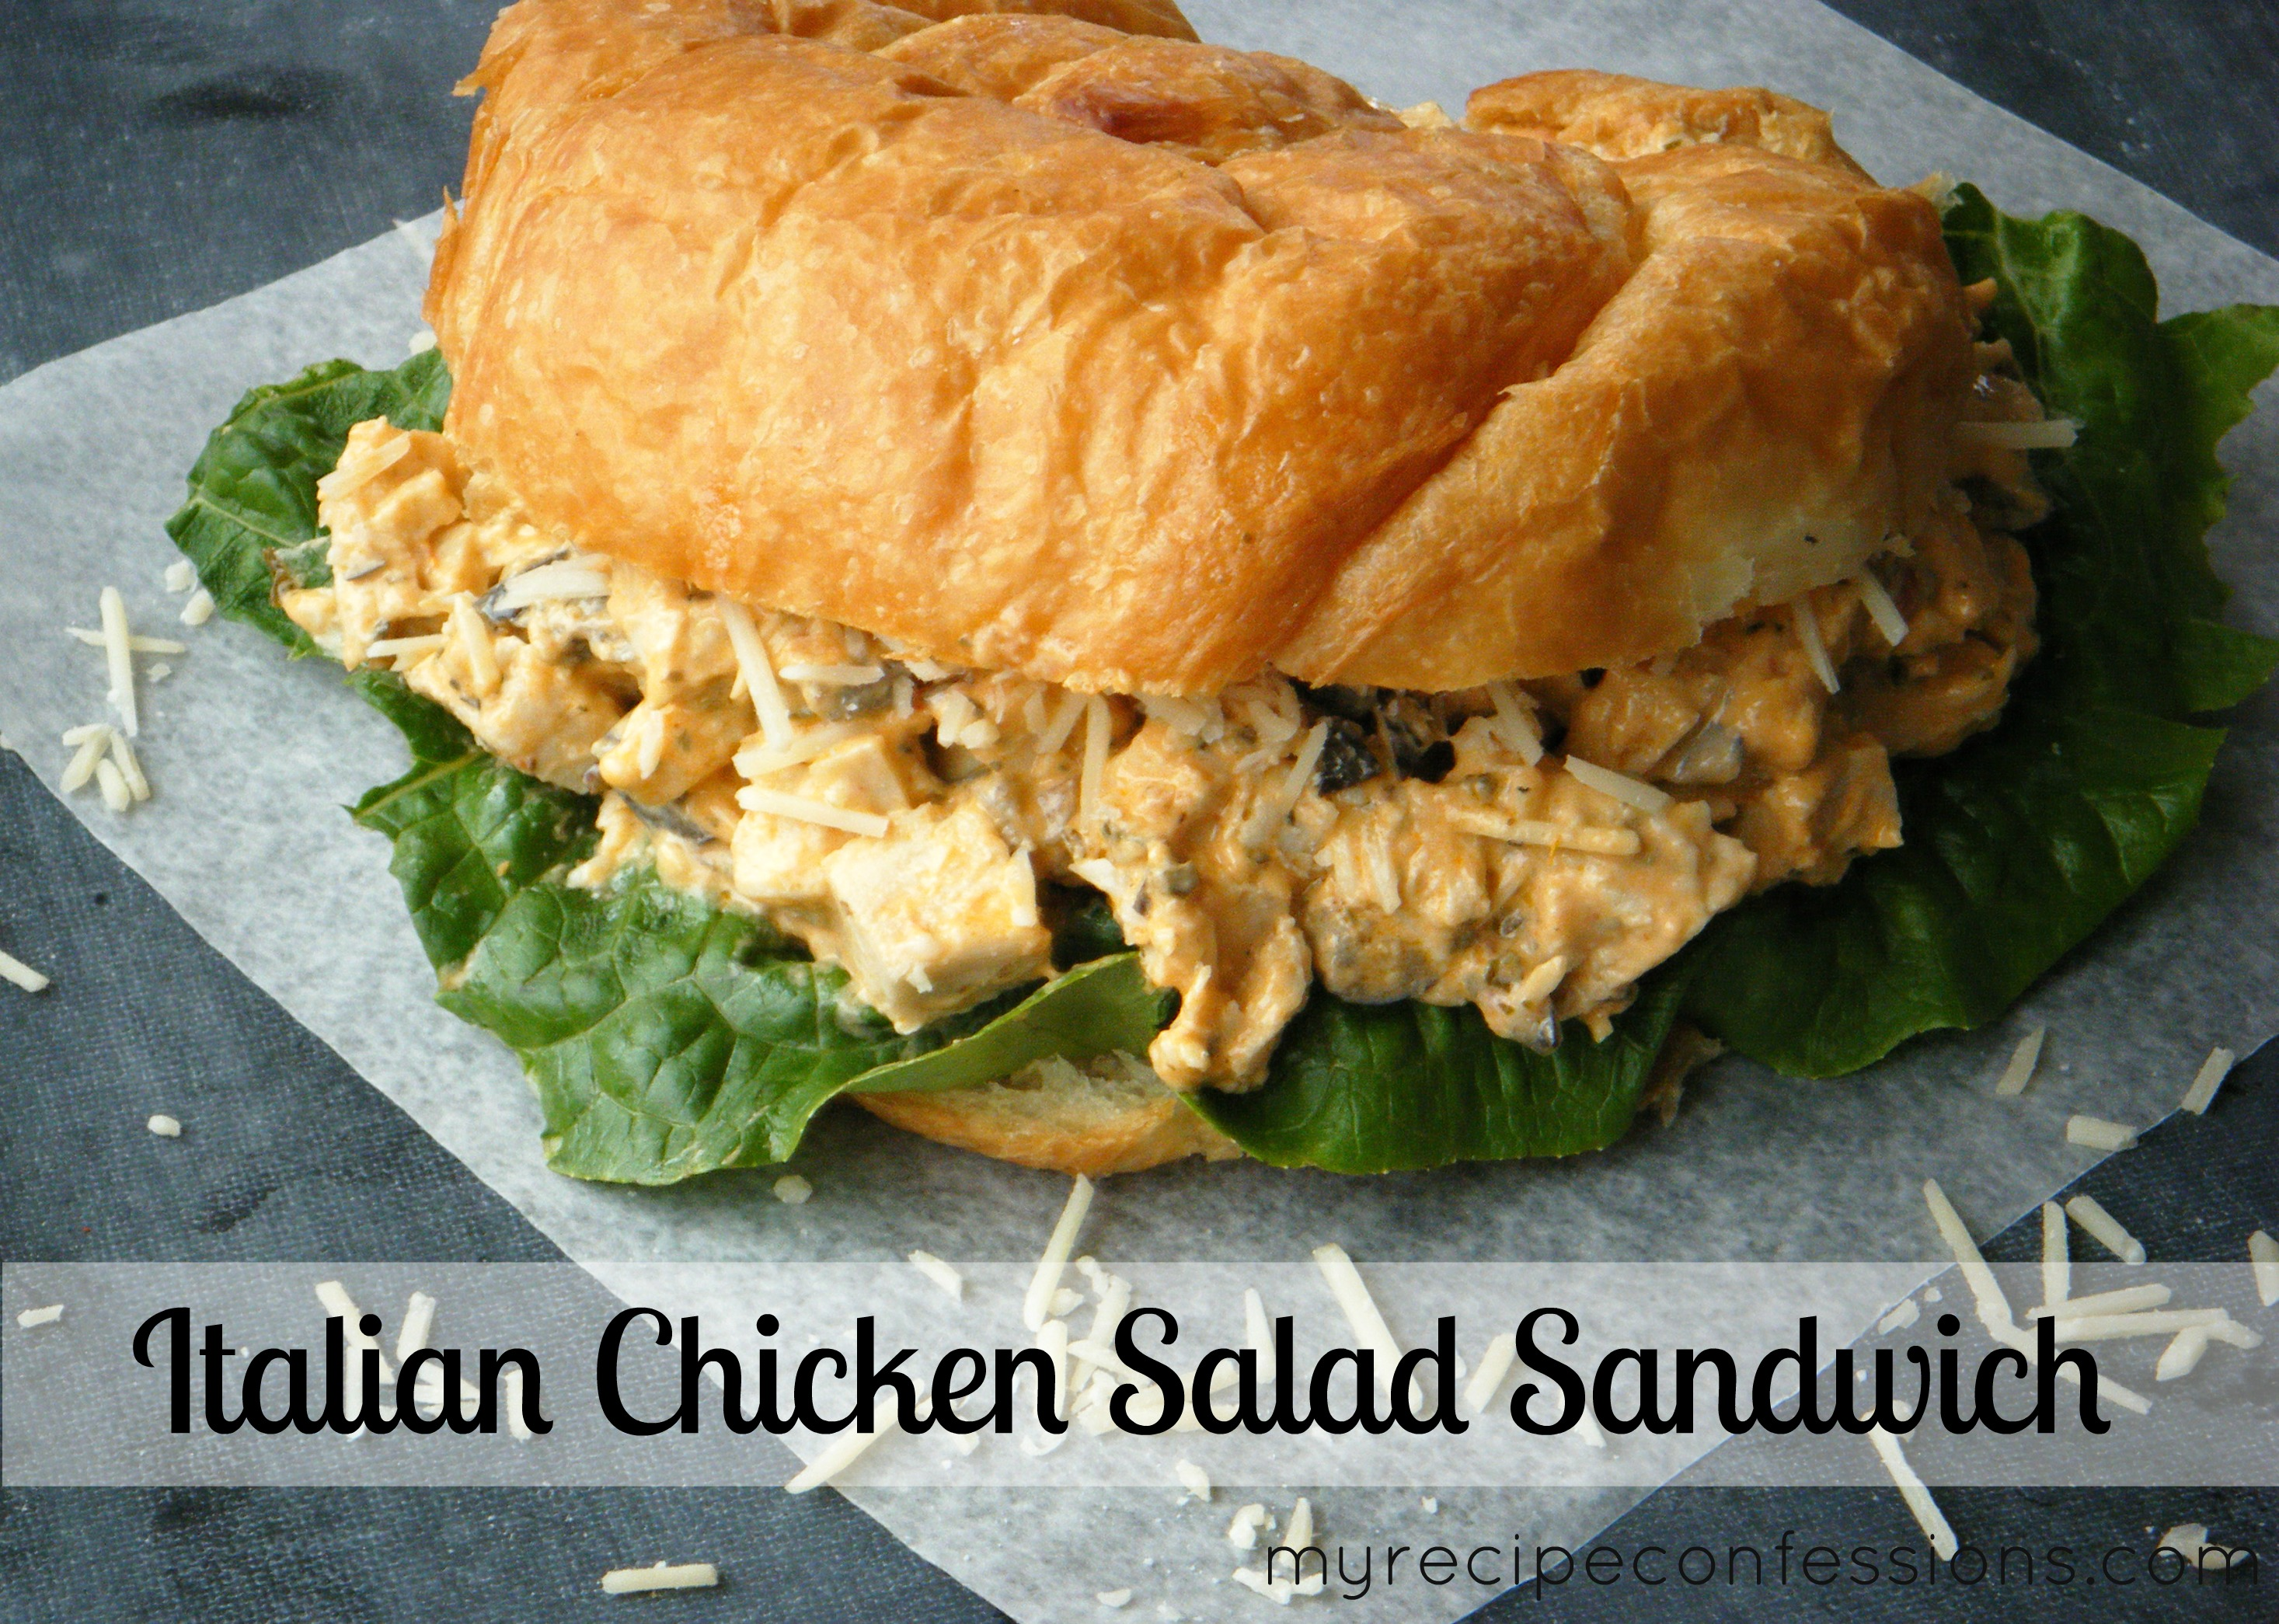 Italian Chicken Salad Sandwich - My Recipe Confessions